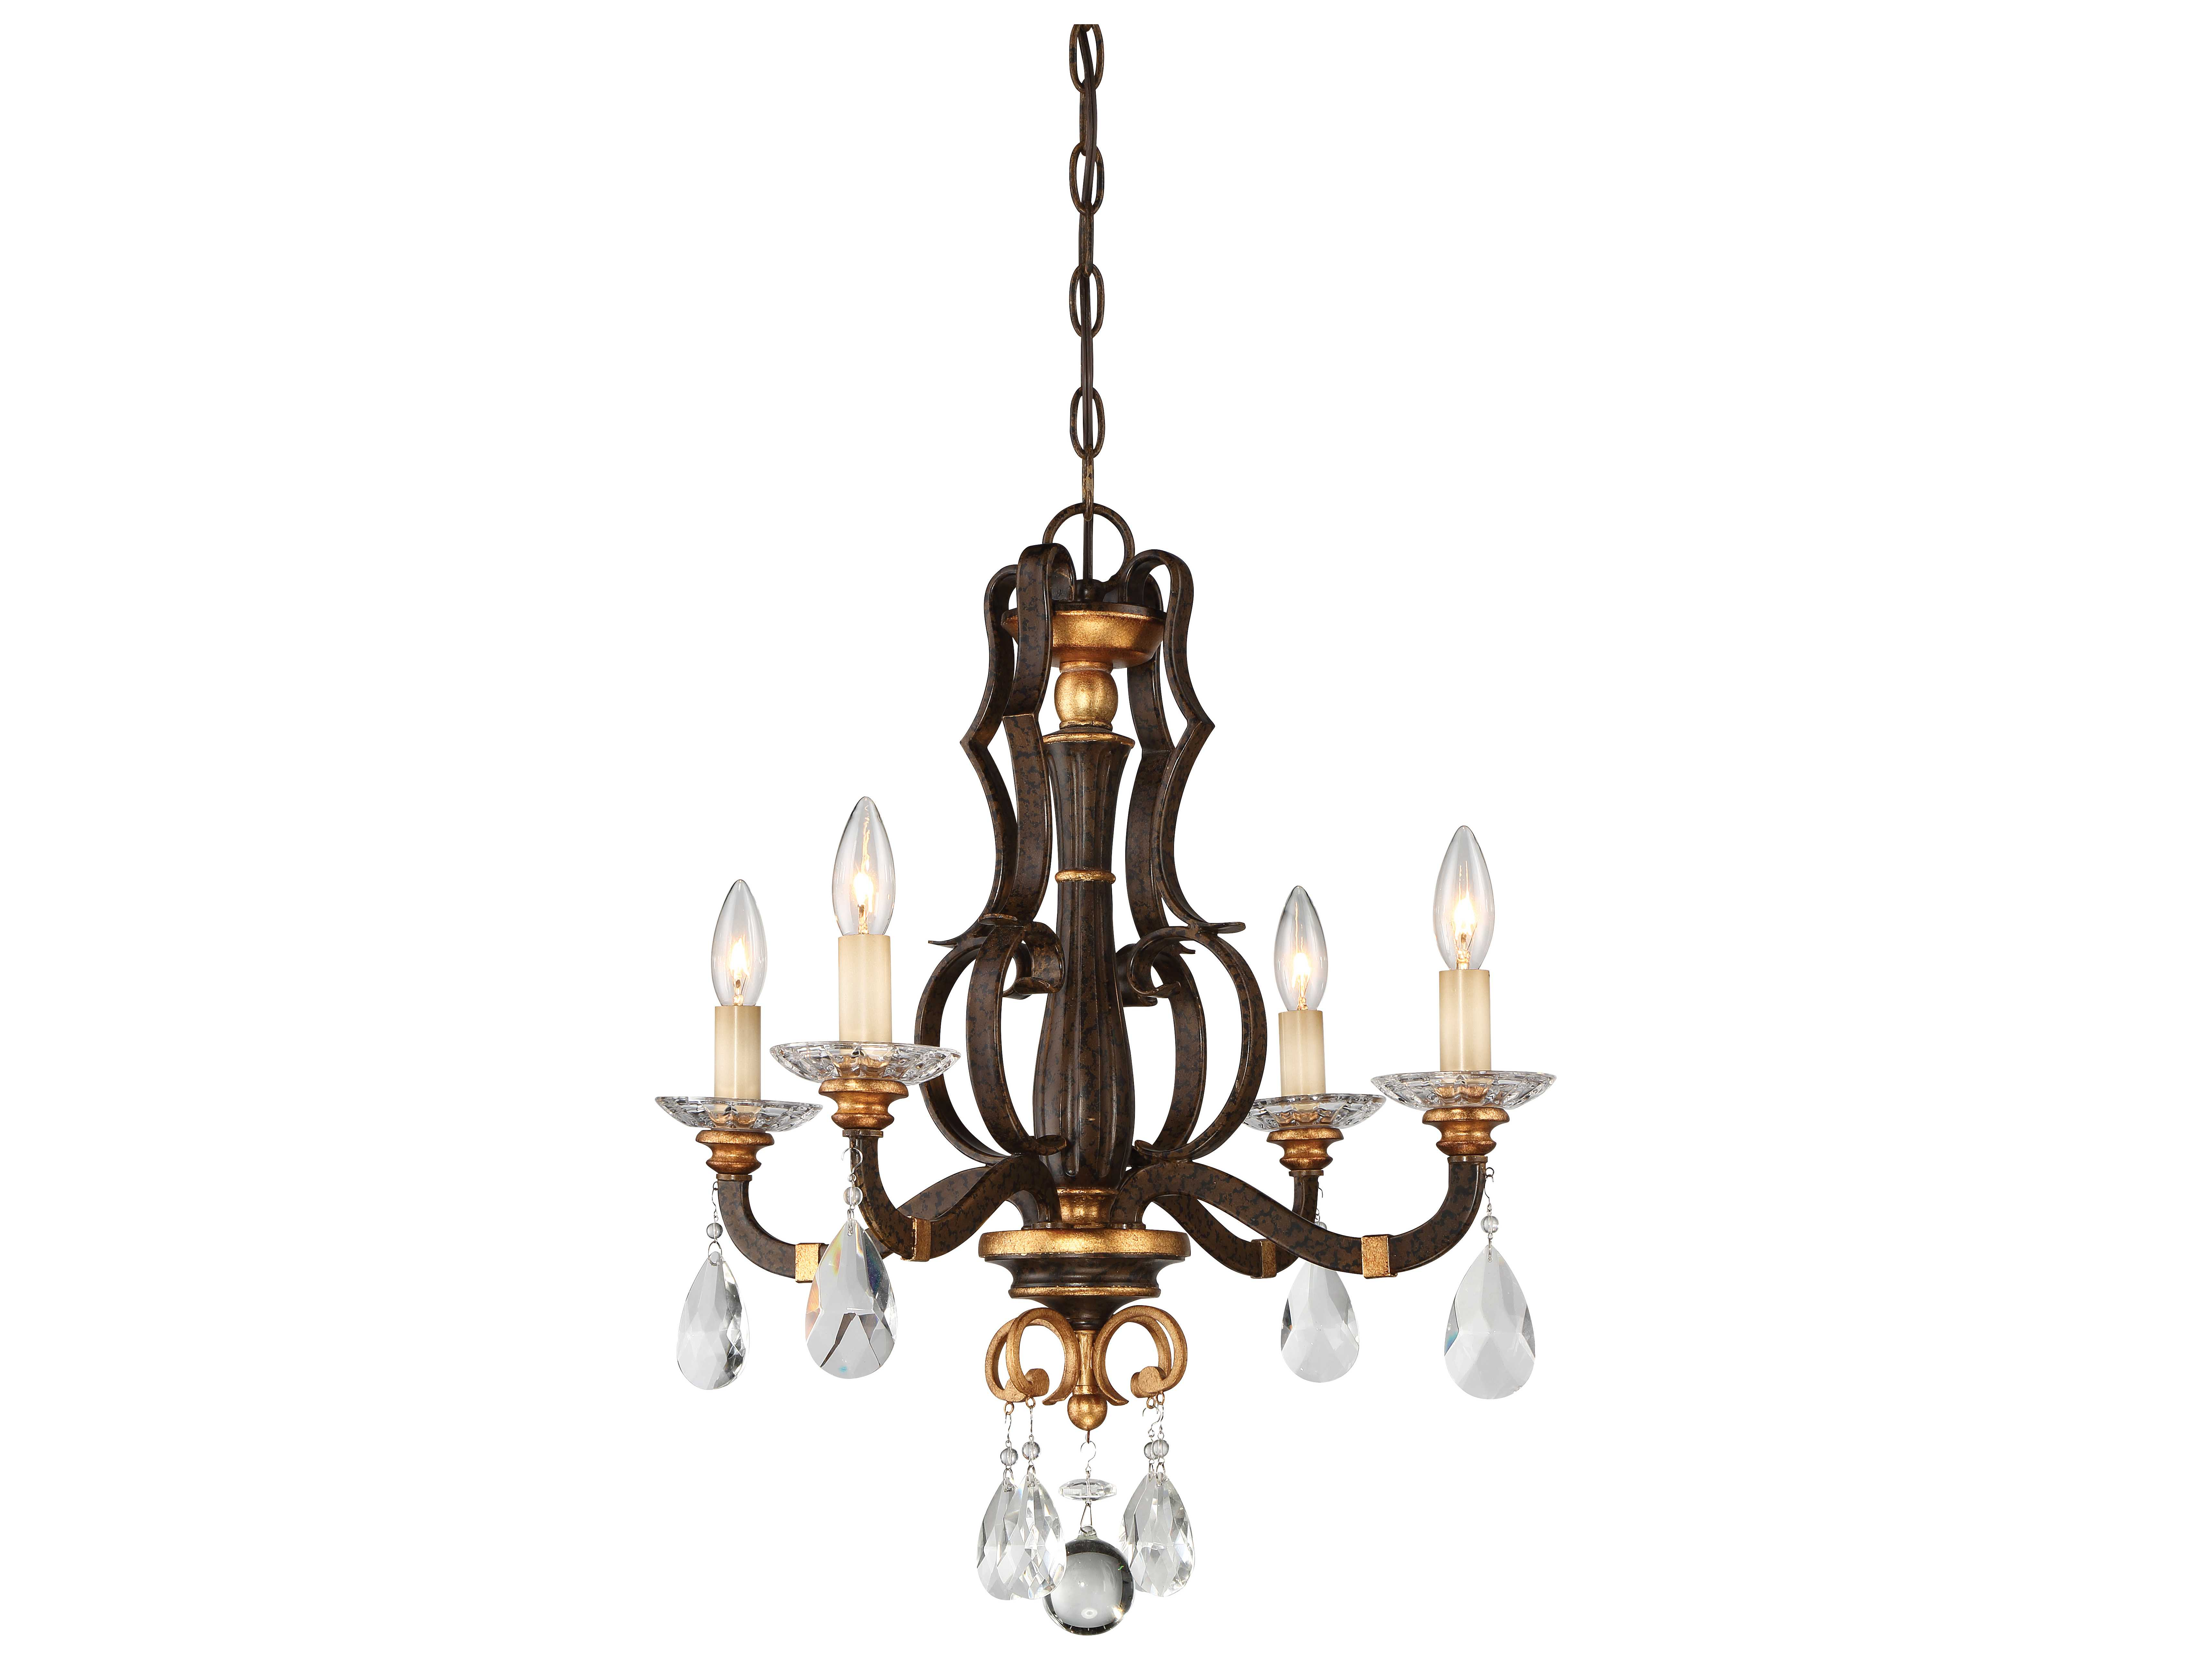 Metropolitan Lighting Cau Les Raven Bronze With Sunburst Gold Leaf Highlights Four Light 21 Wide Mini Chandelier